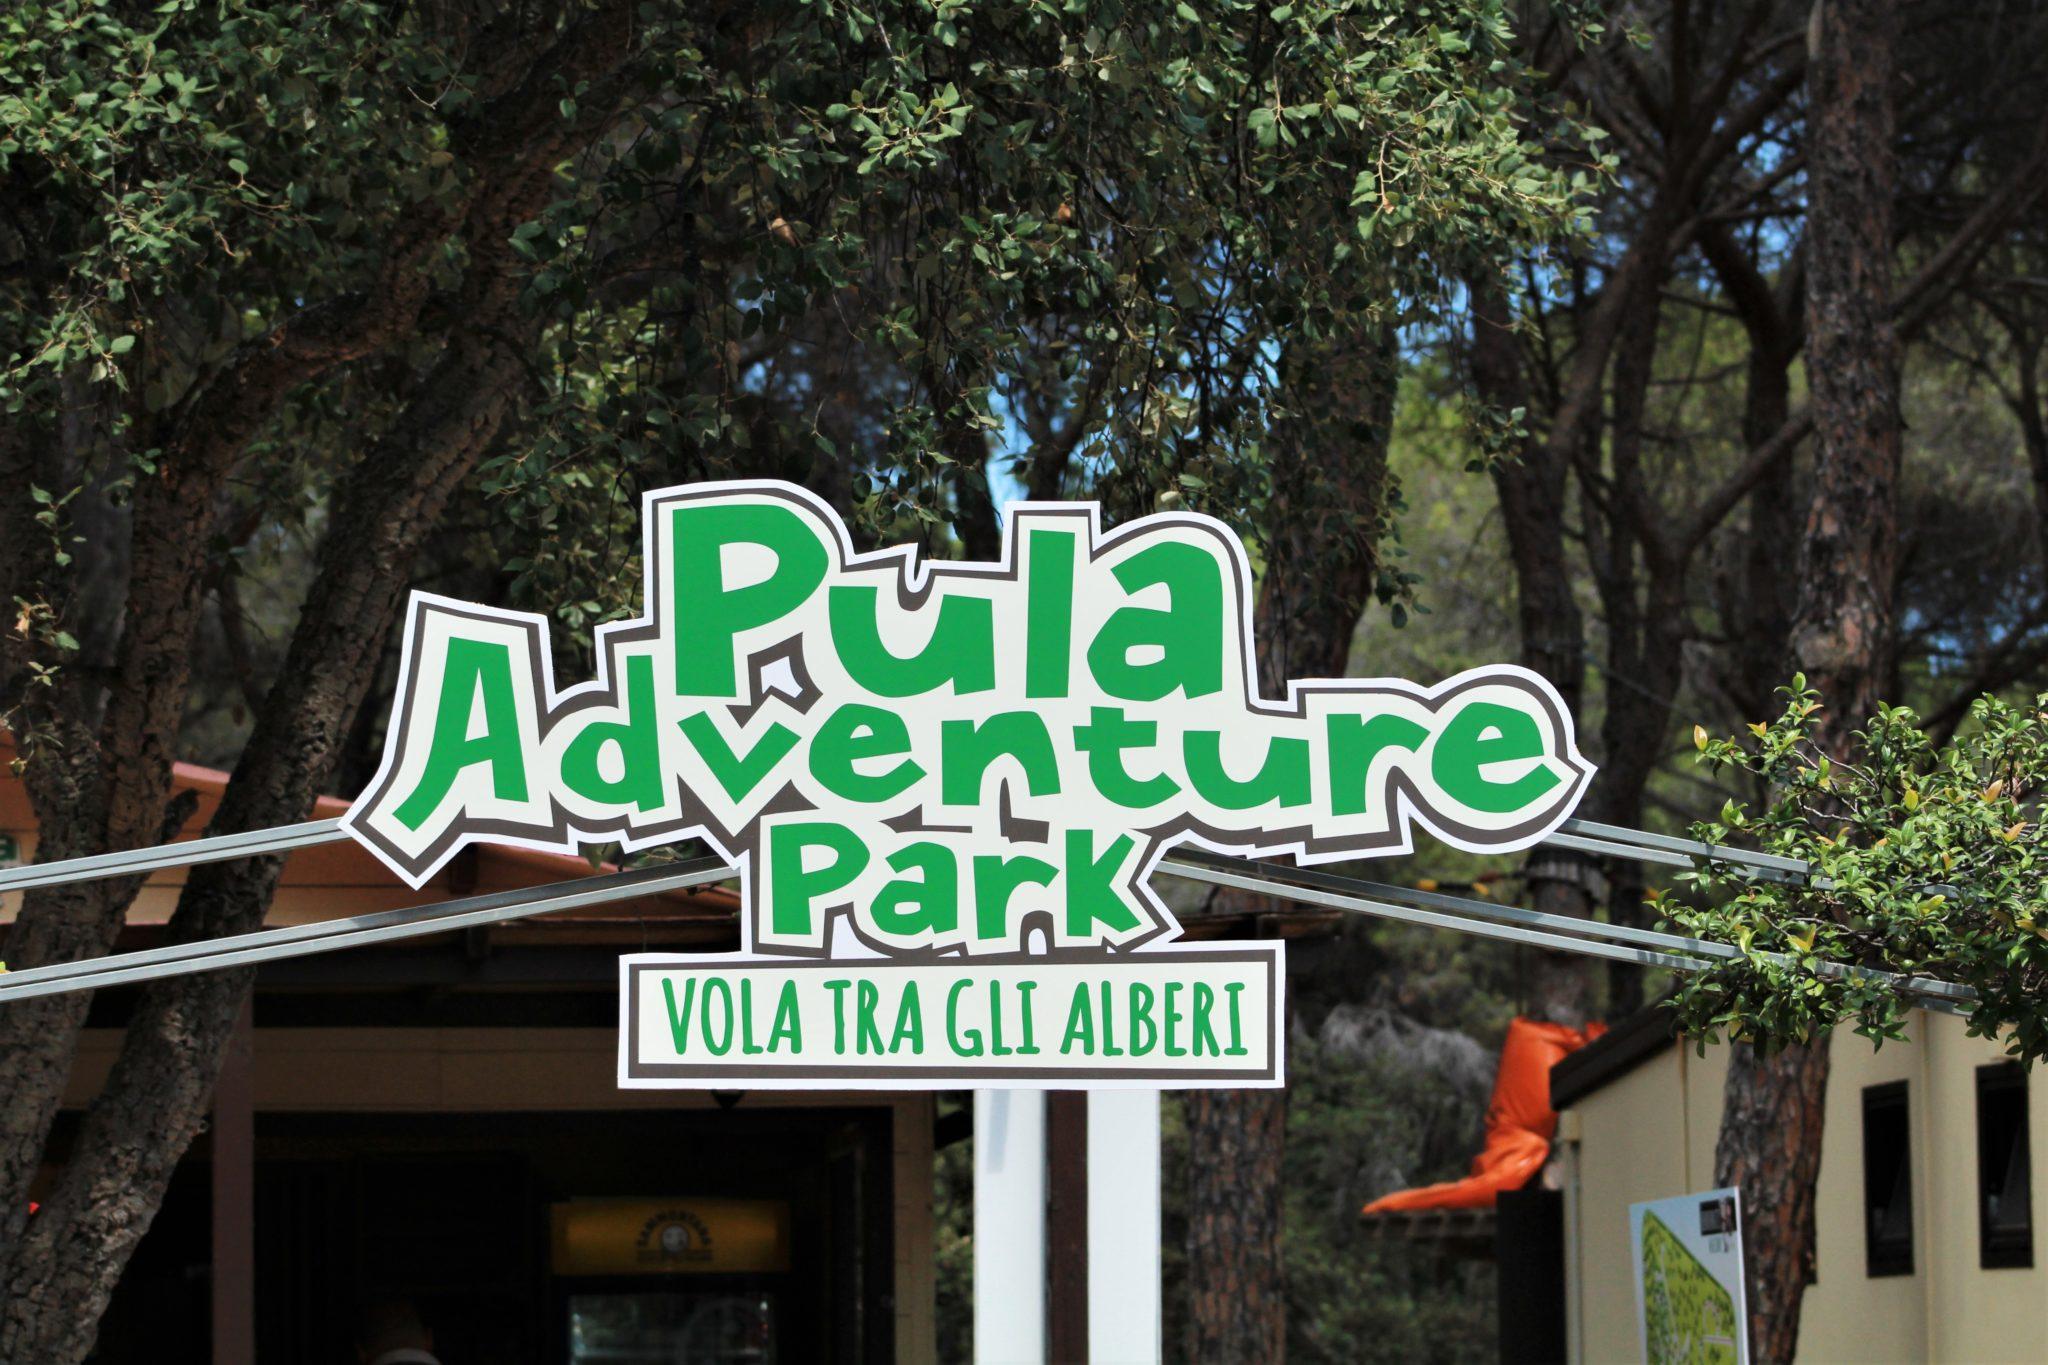 Pula adventure Park